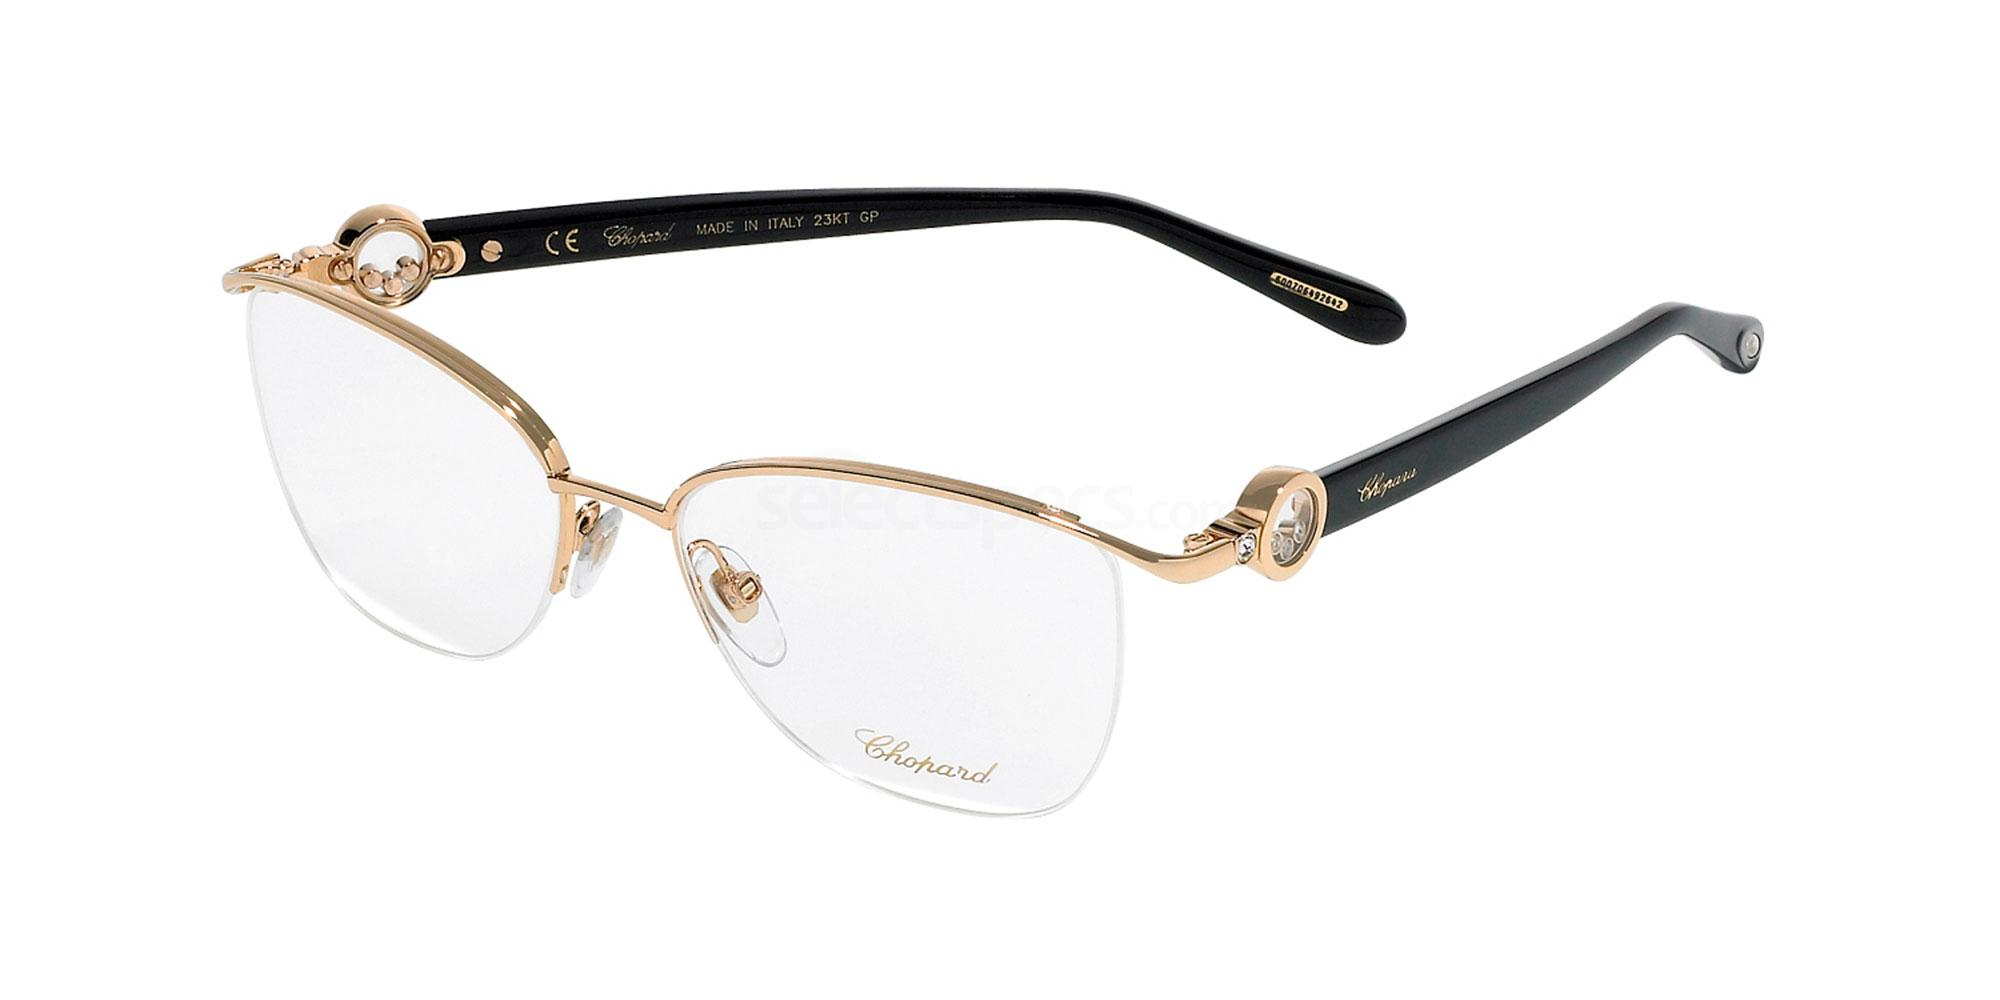 0300 VCHC54S Glasses, Chopard